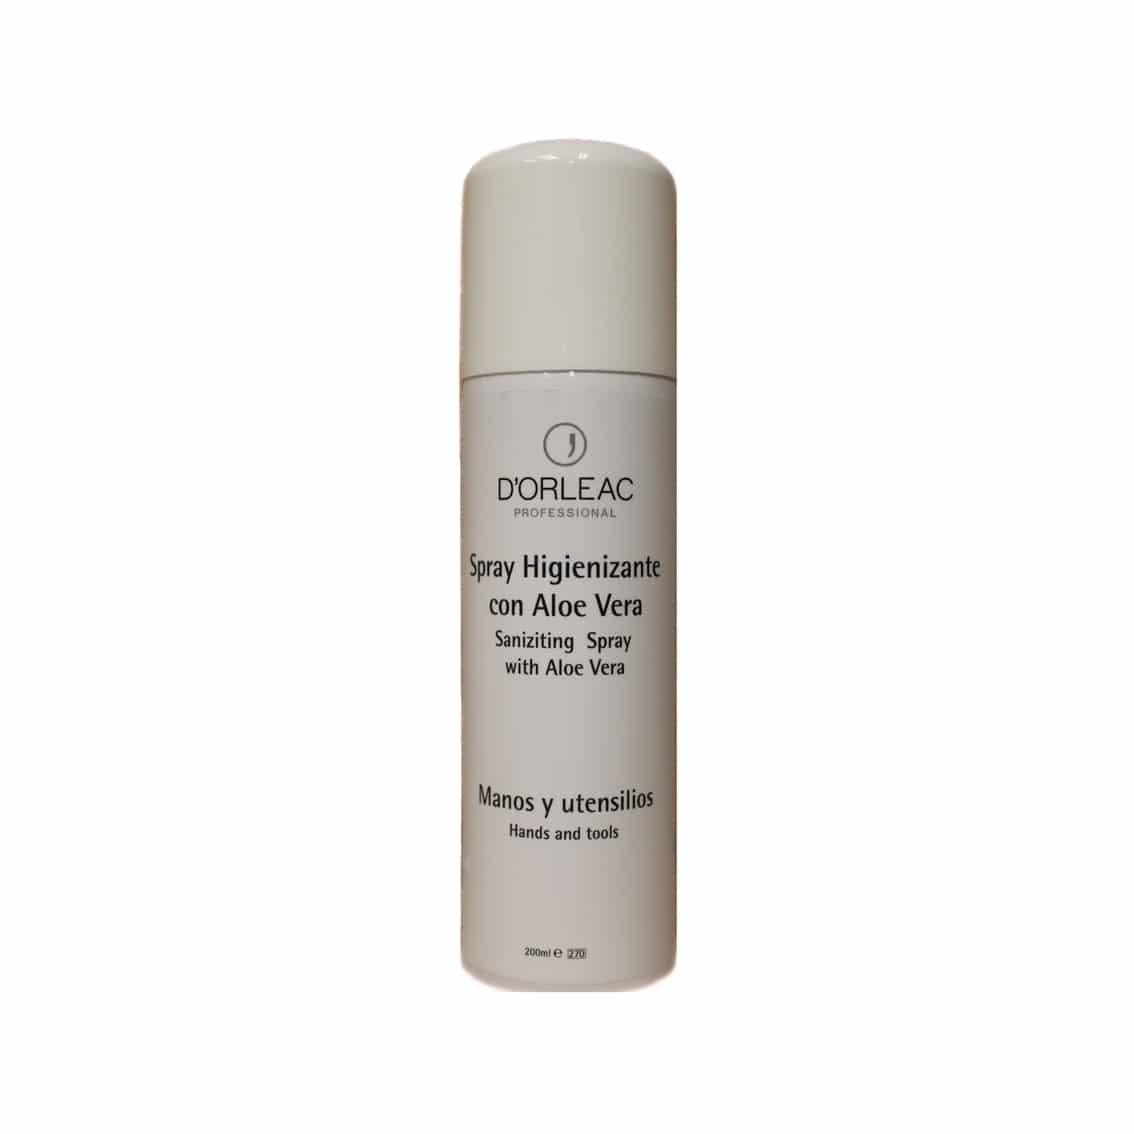 Spray Higienizante Hidroalcohólico 200 ml